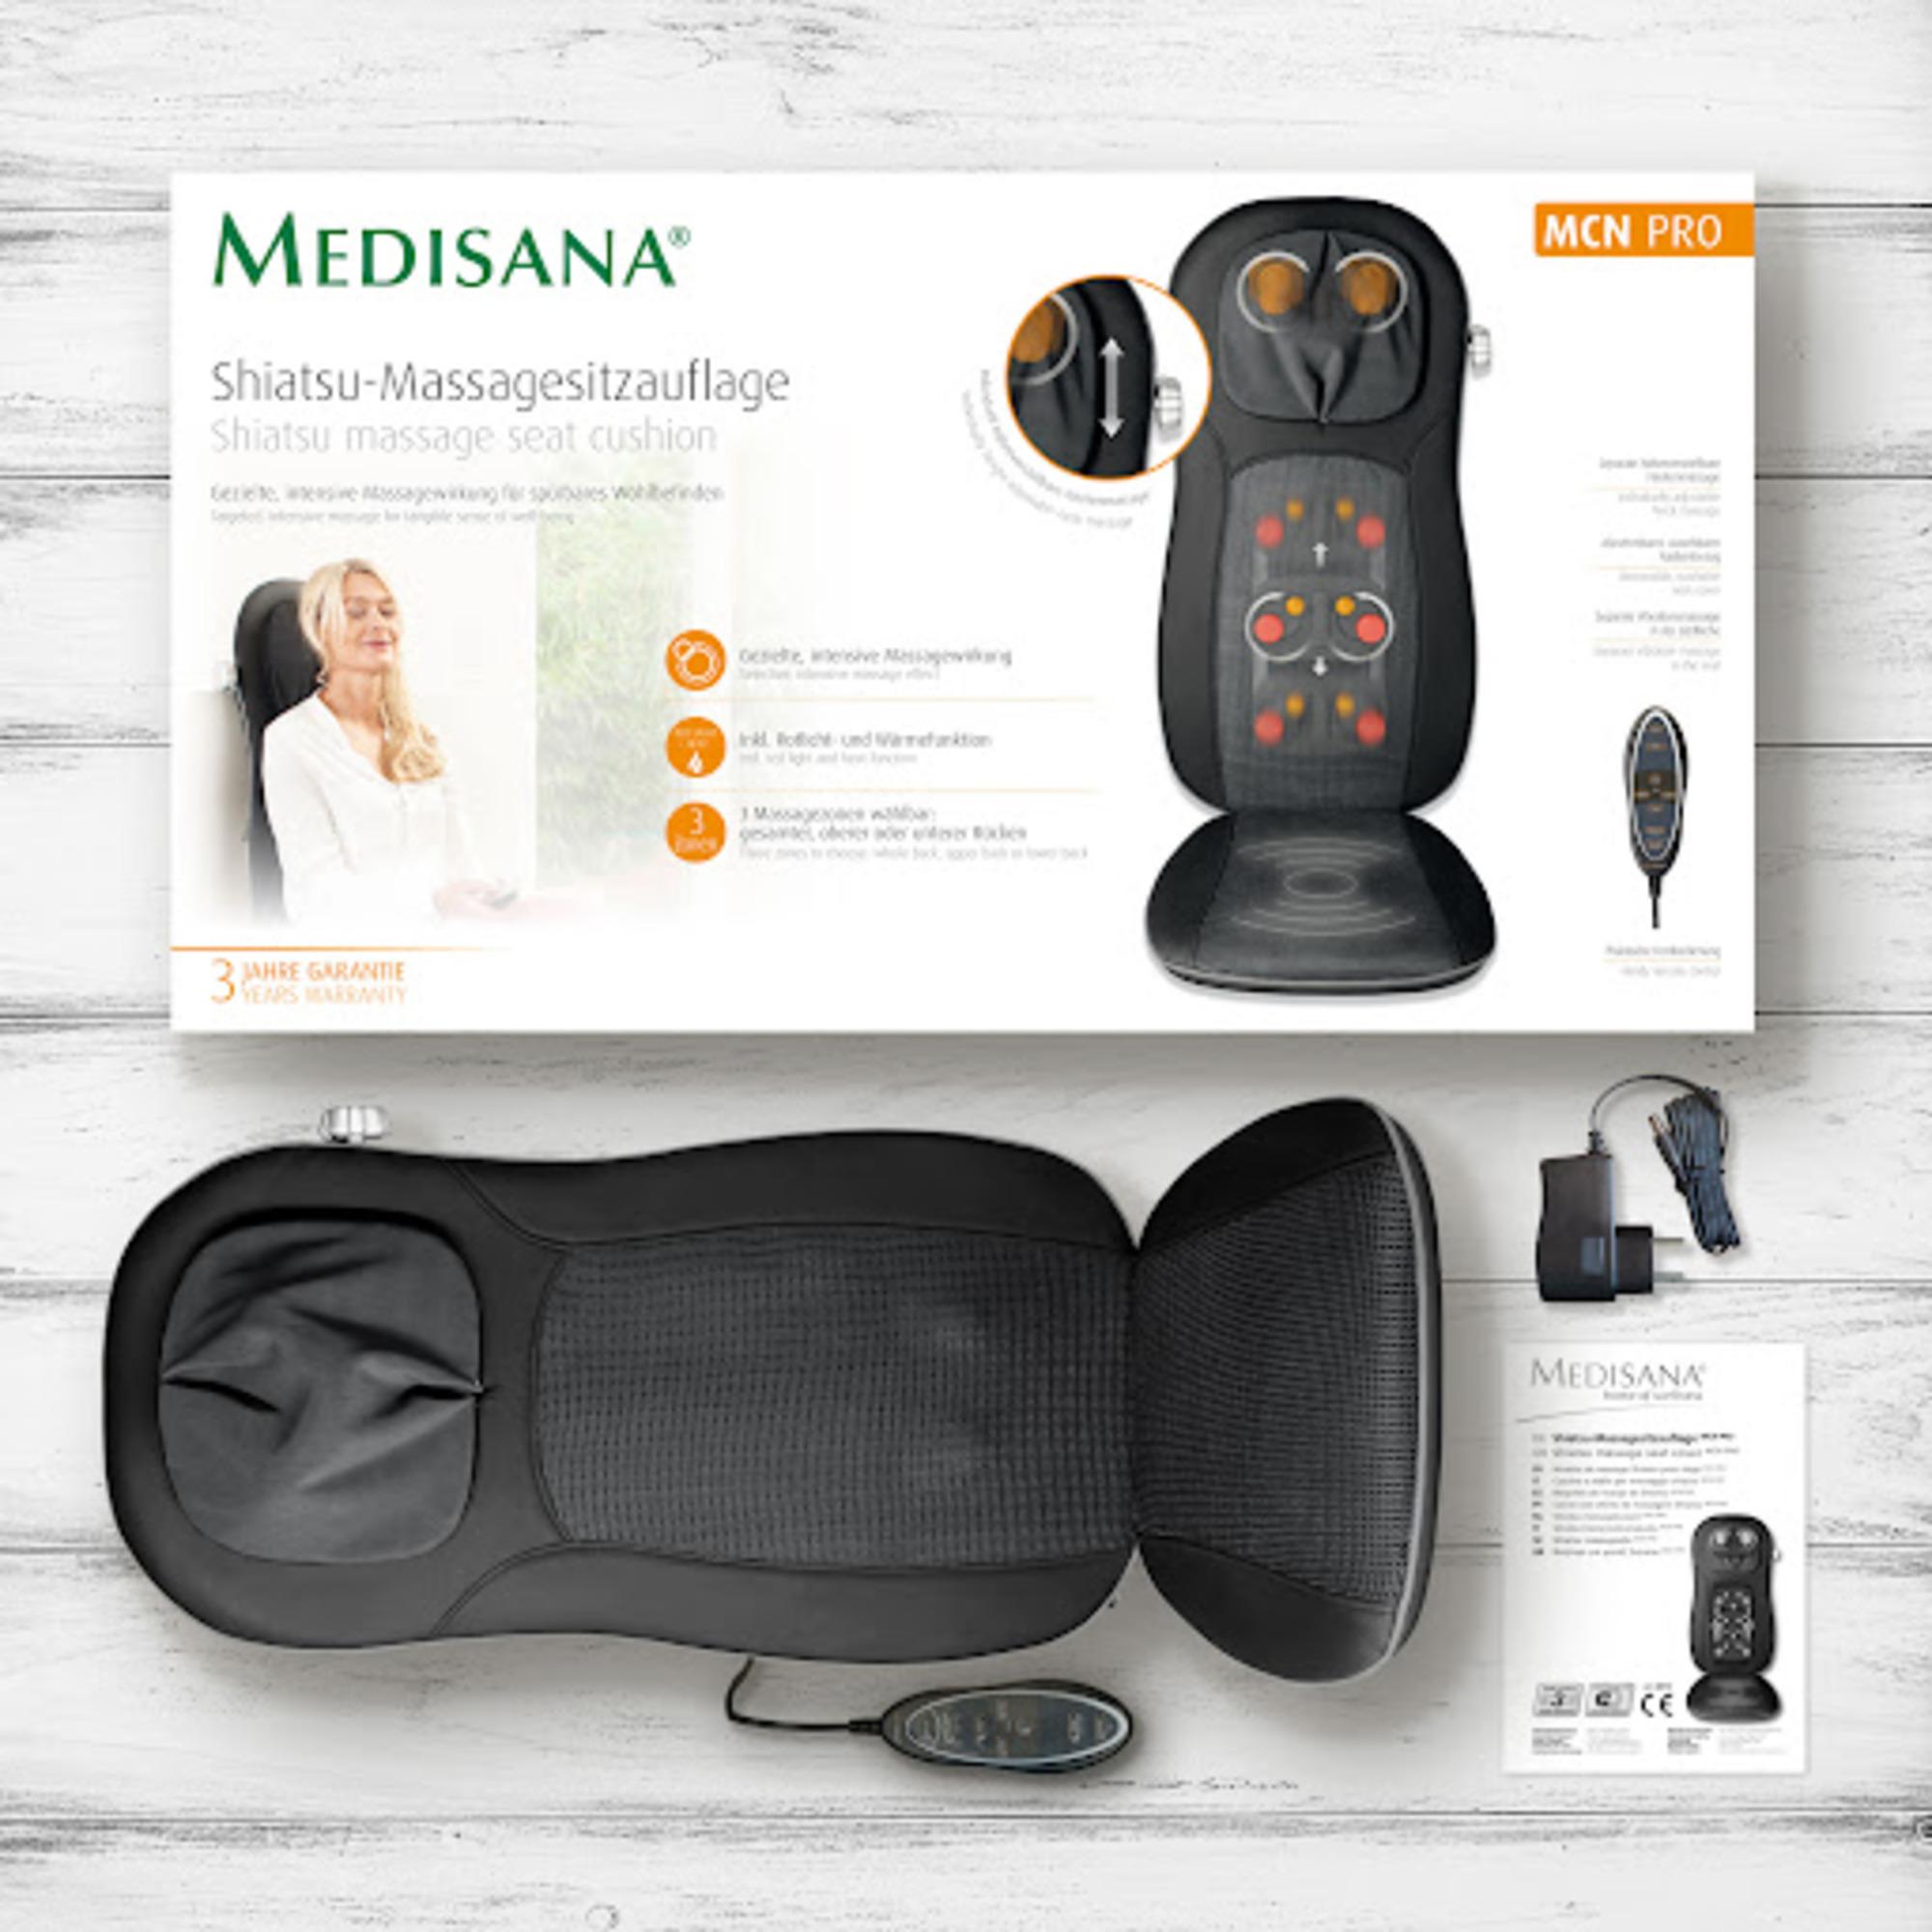 Medisana MCN